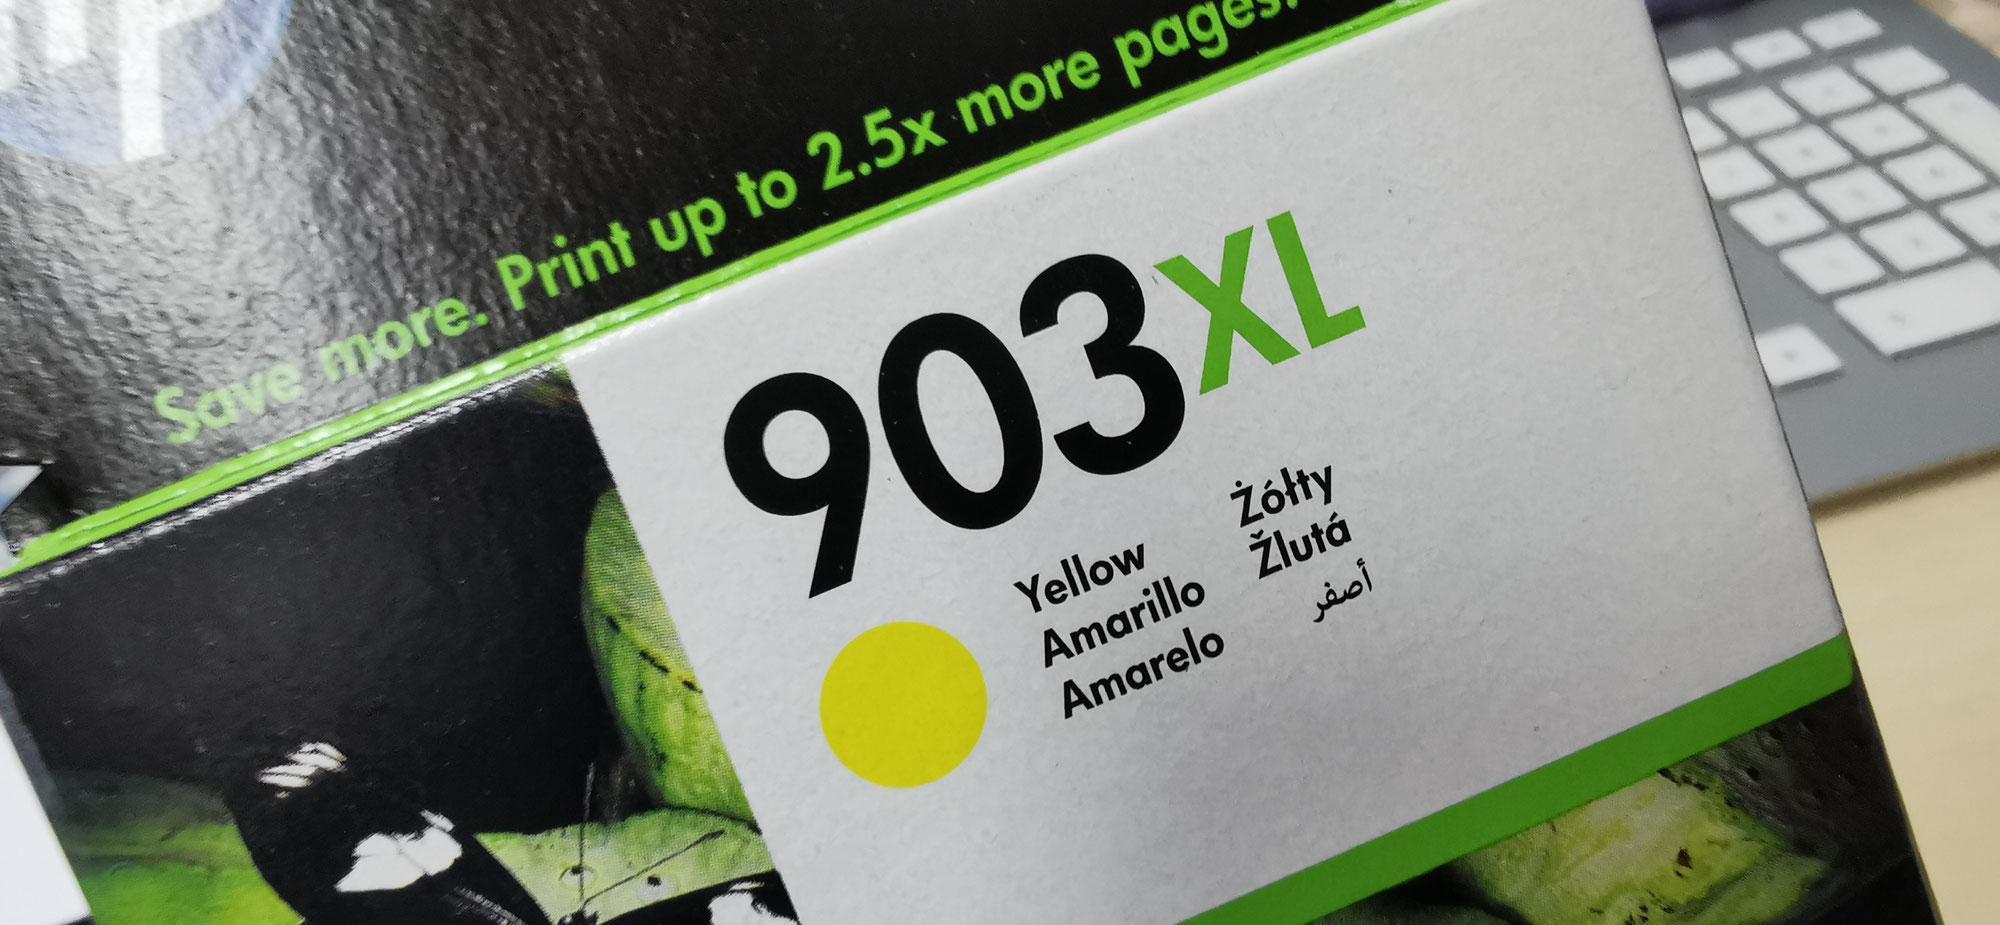 Qualitätsproblem bei Original HP Druckerpatronen folgender Serien: